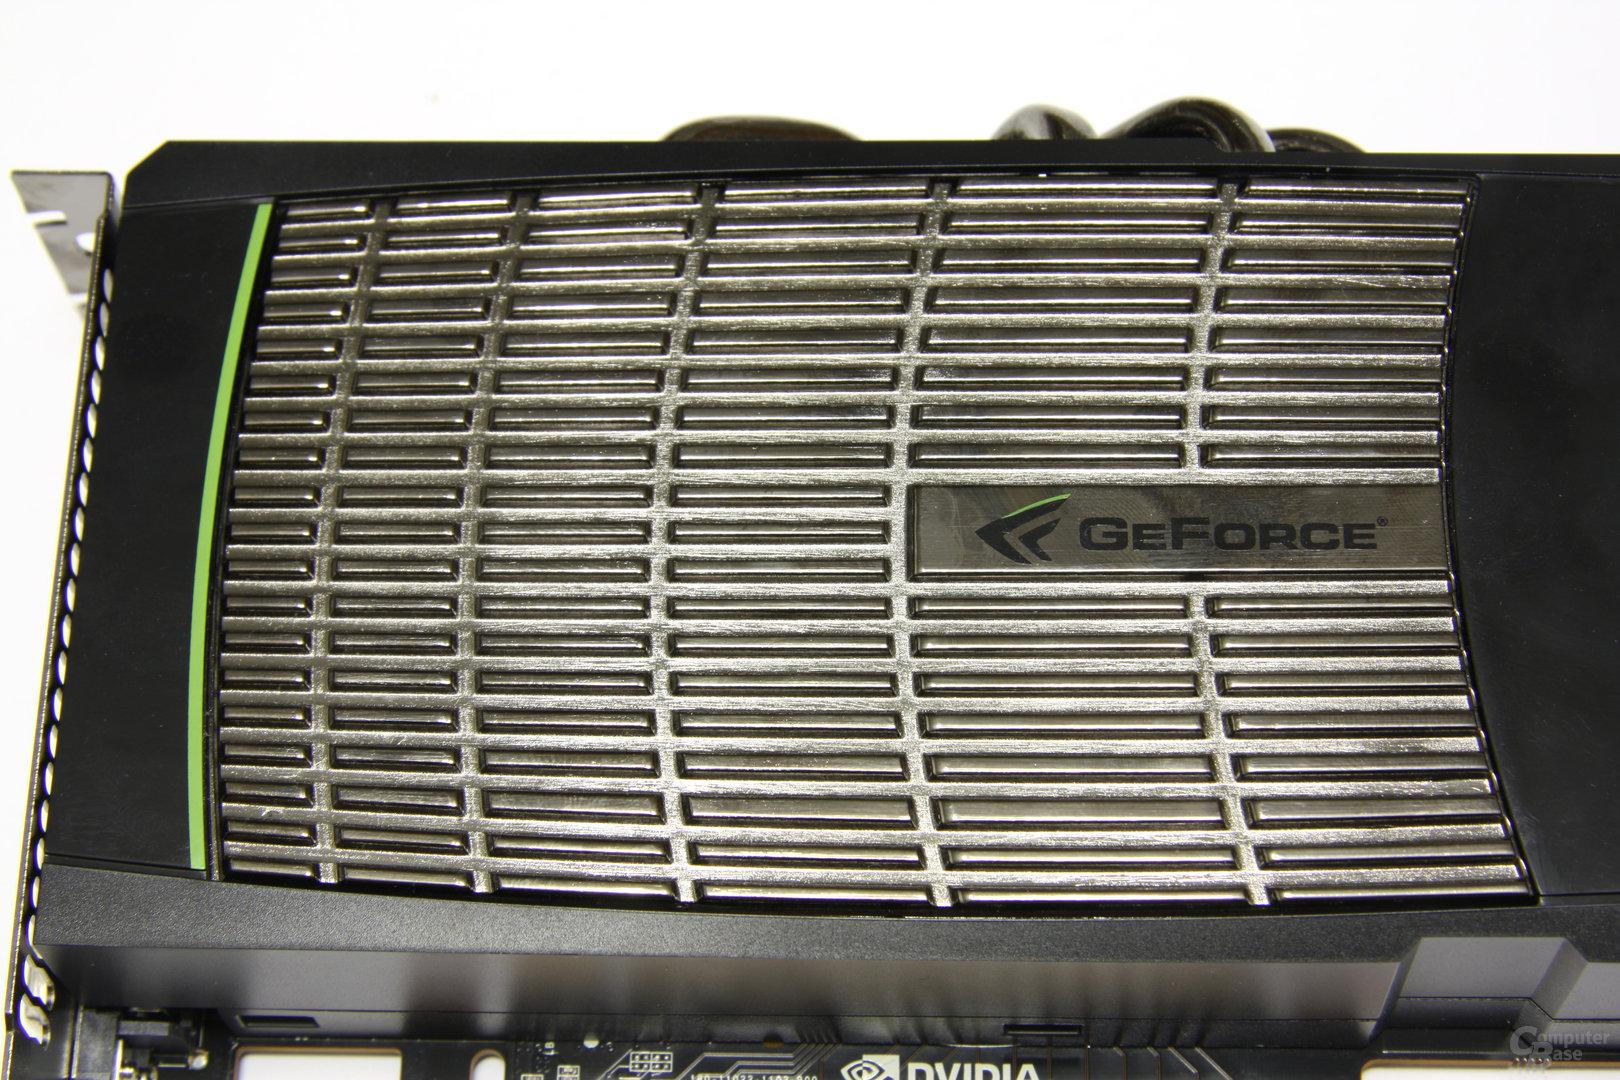 GeForce GTX 480 Metallkörper